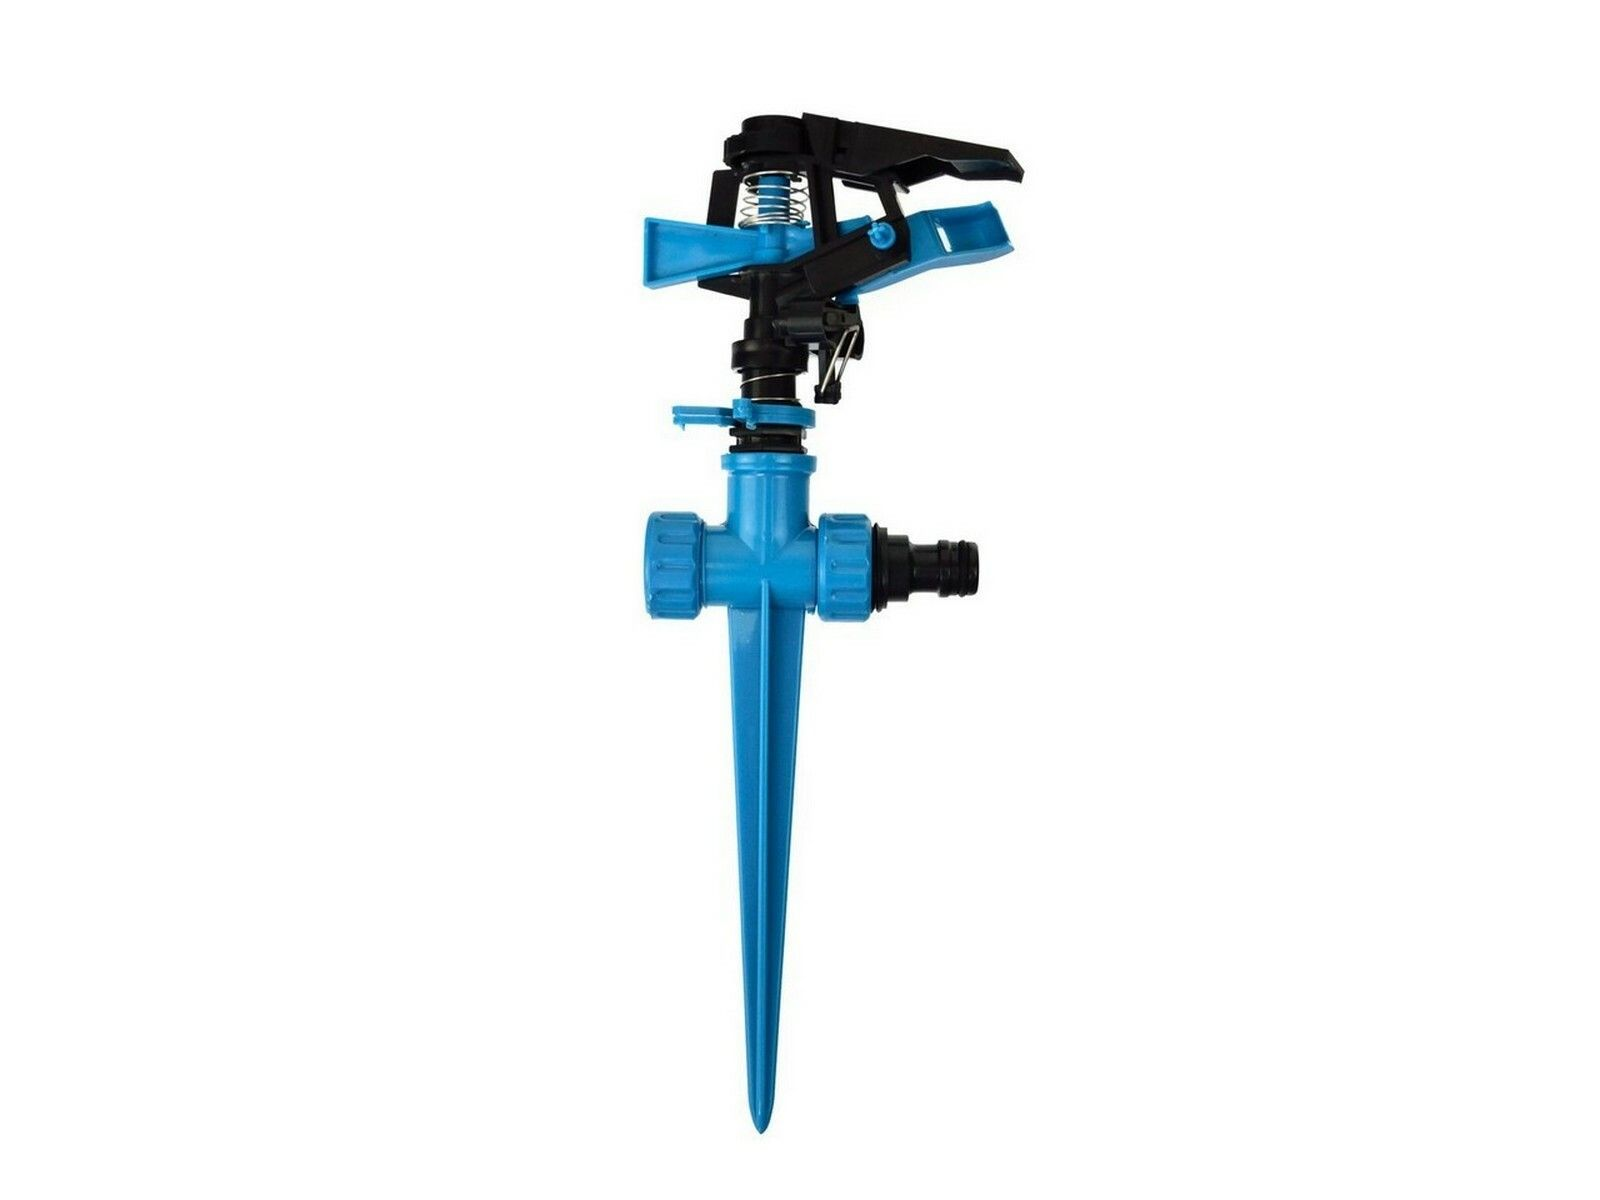 Postřikovač pulzní plastový (trkač), GEKO G73050